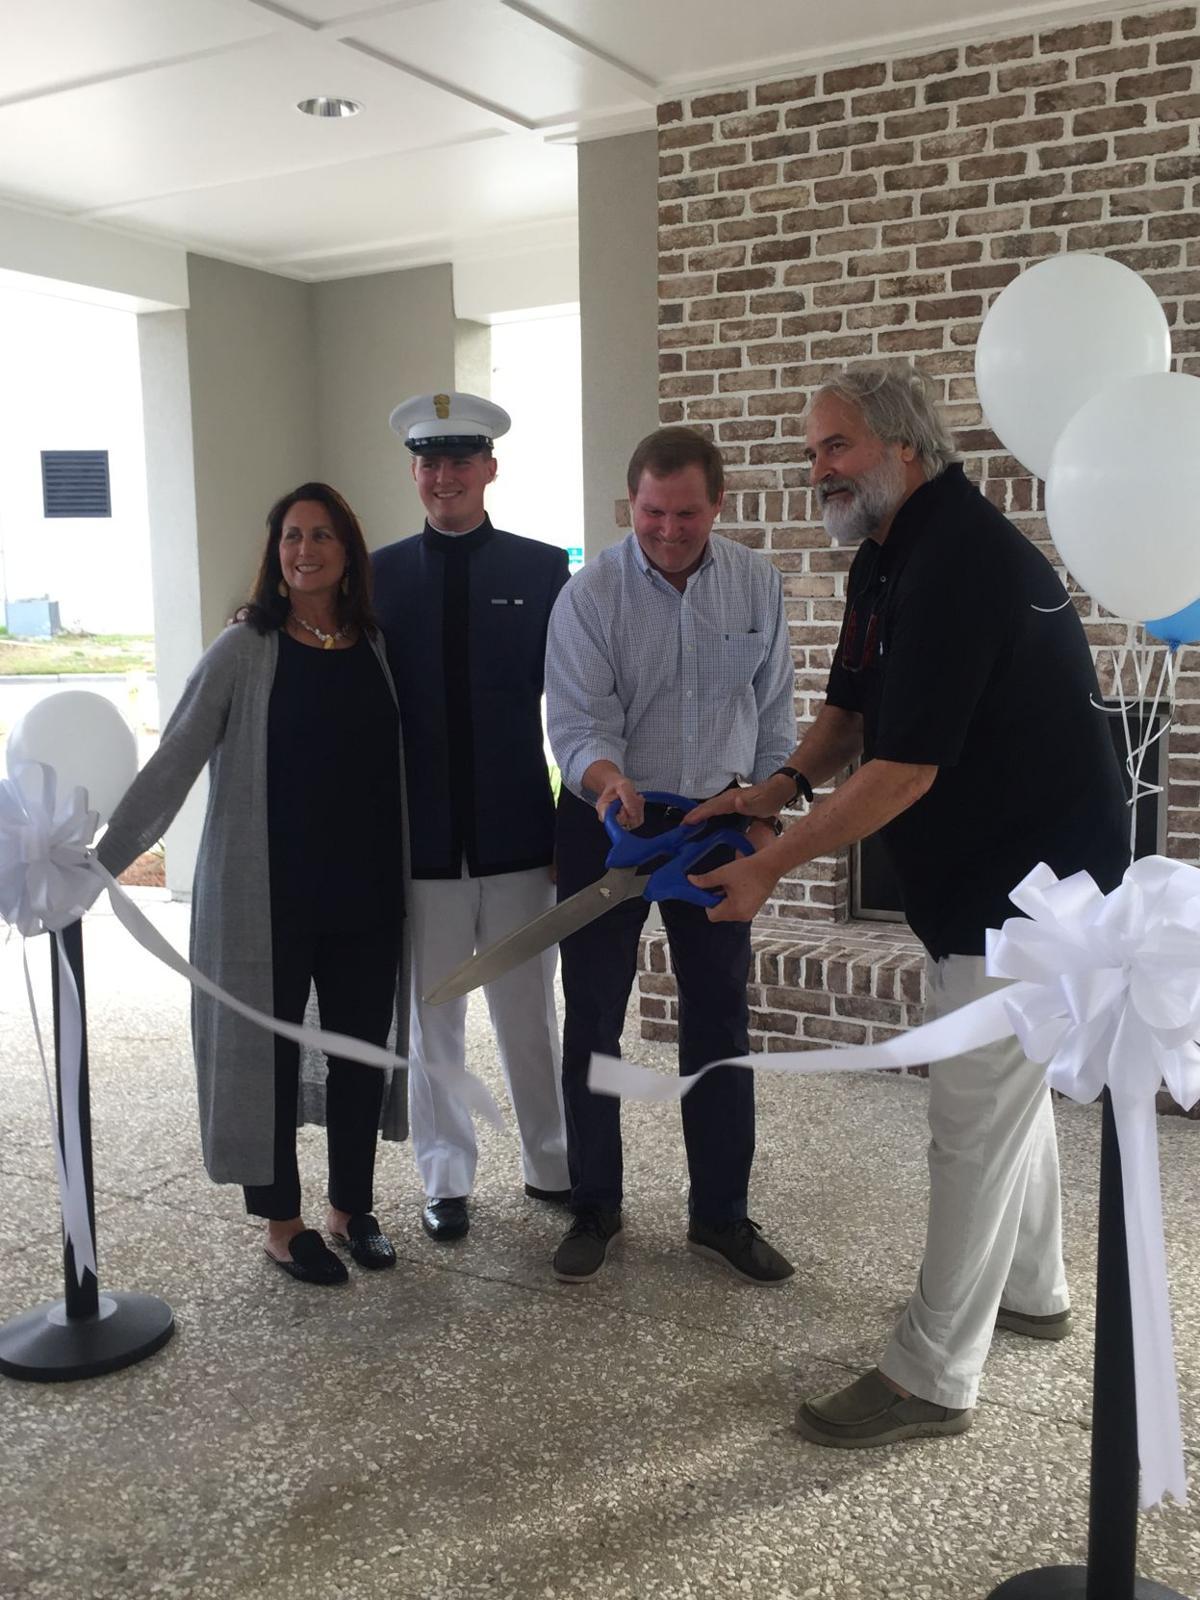 Debbie Swain, Connor Swain, Chris Swain, Rick McGeorge. Swain Boat pavilion ribbon cutting..jpg